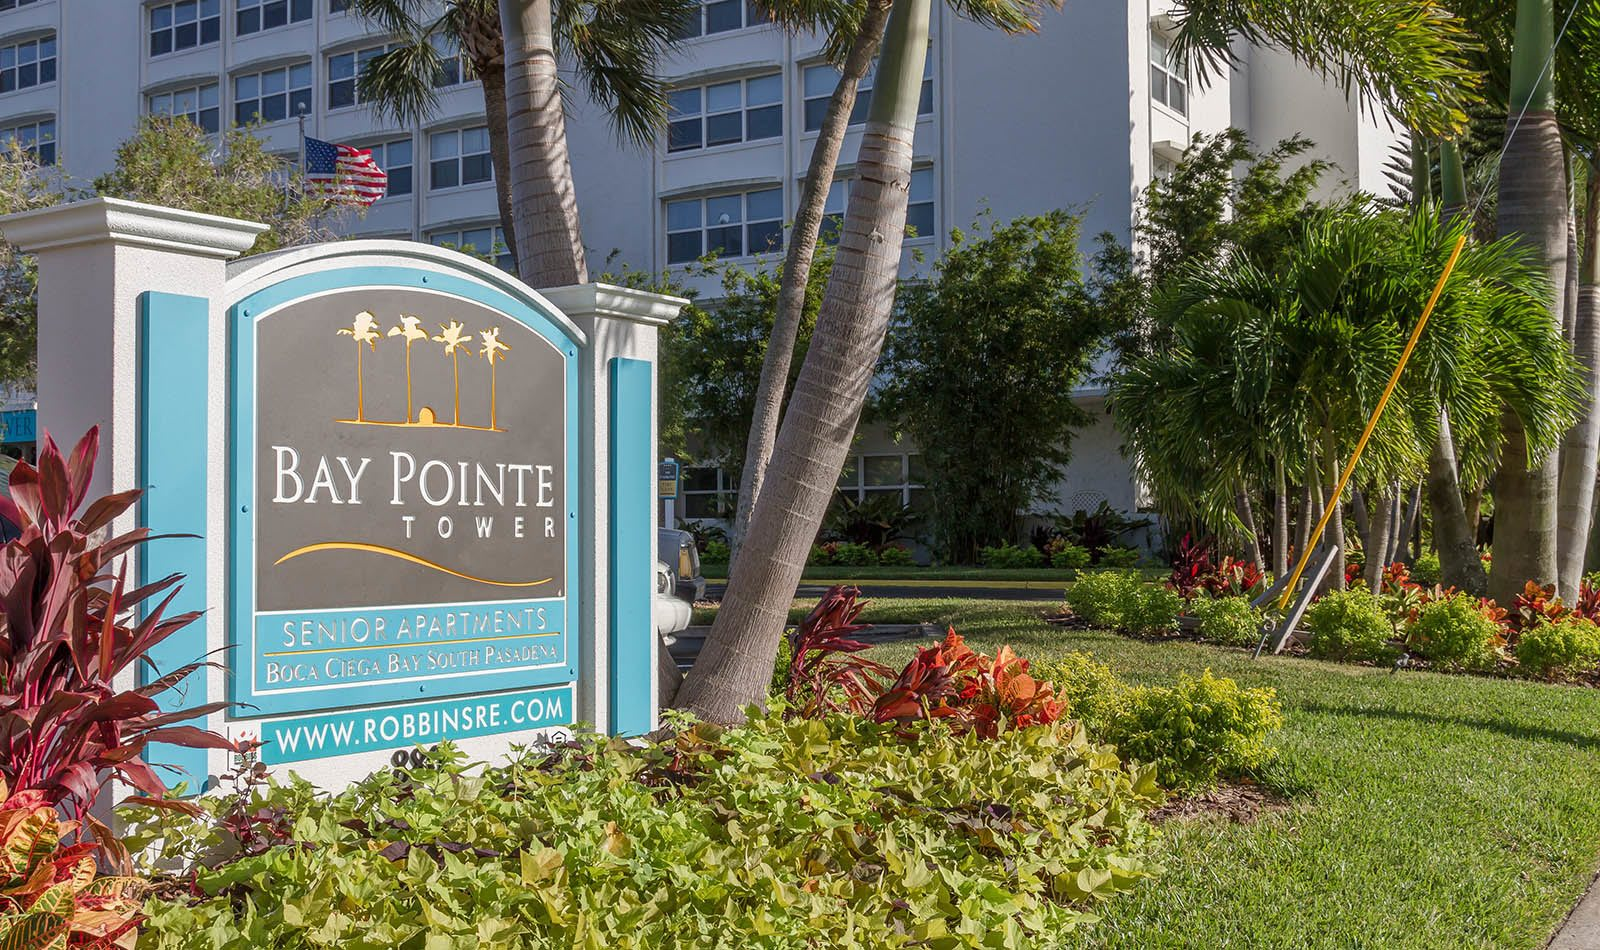 Signage at Bay Pointe Tower in South Pasadena, FL